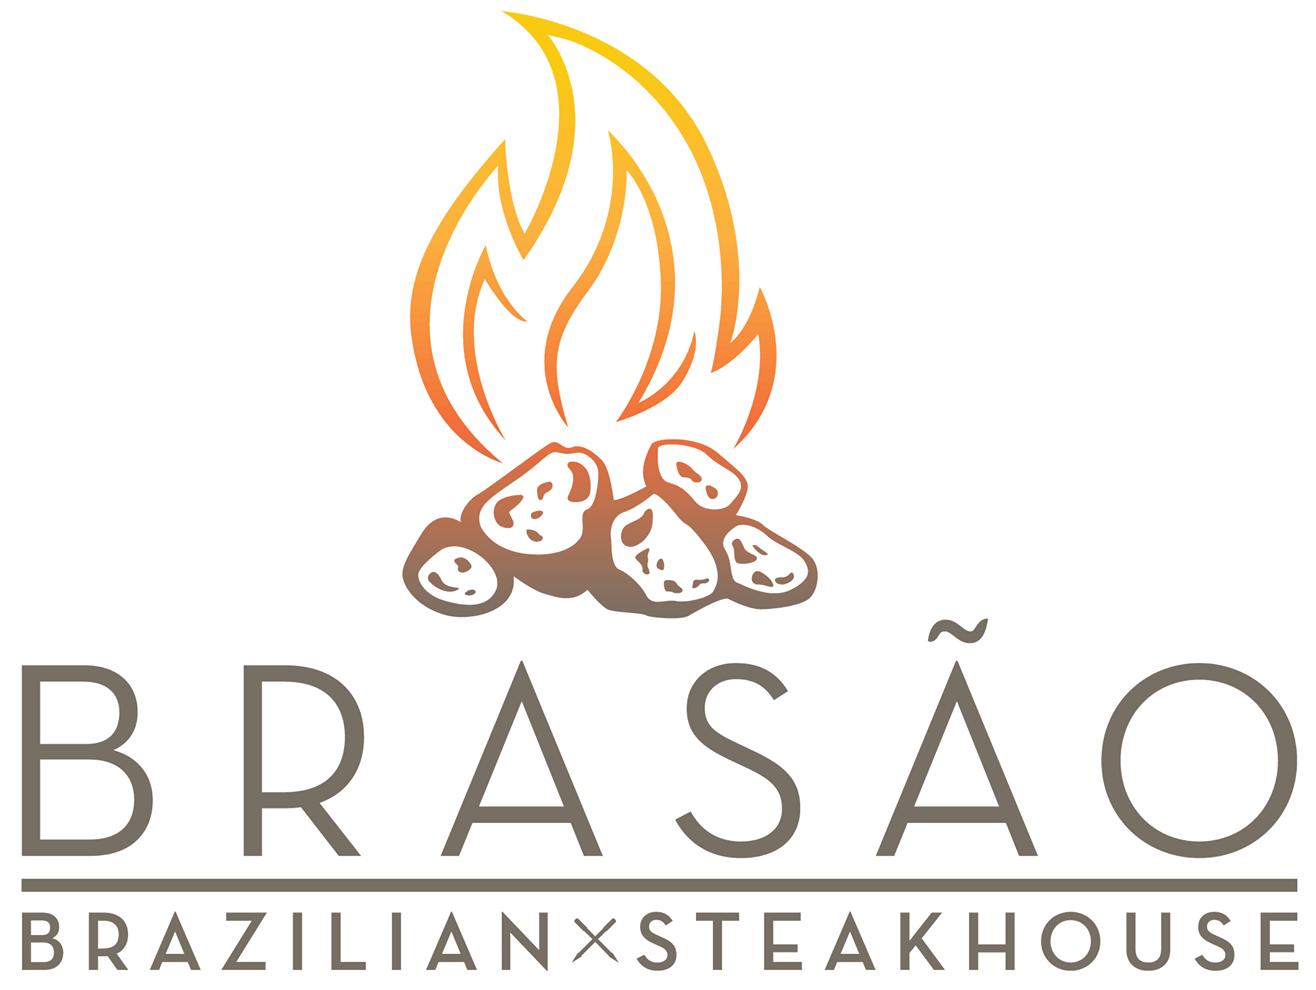 Brasão Brazilian Steakhouse Logo